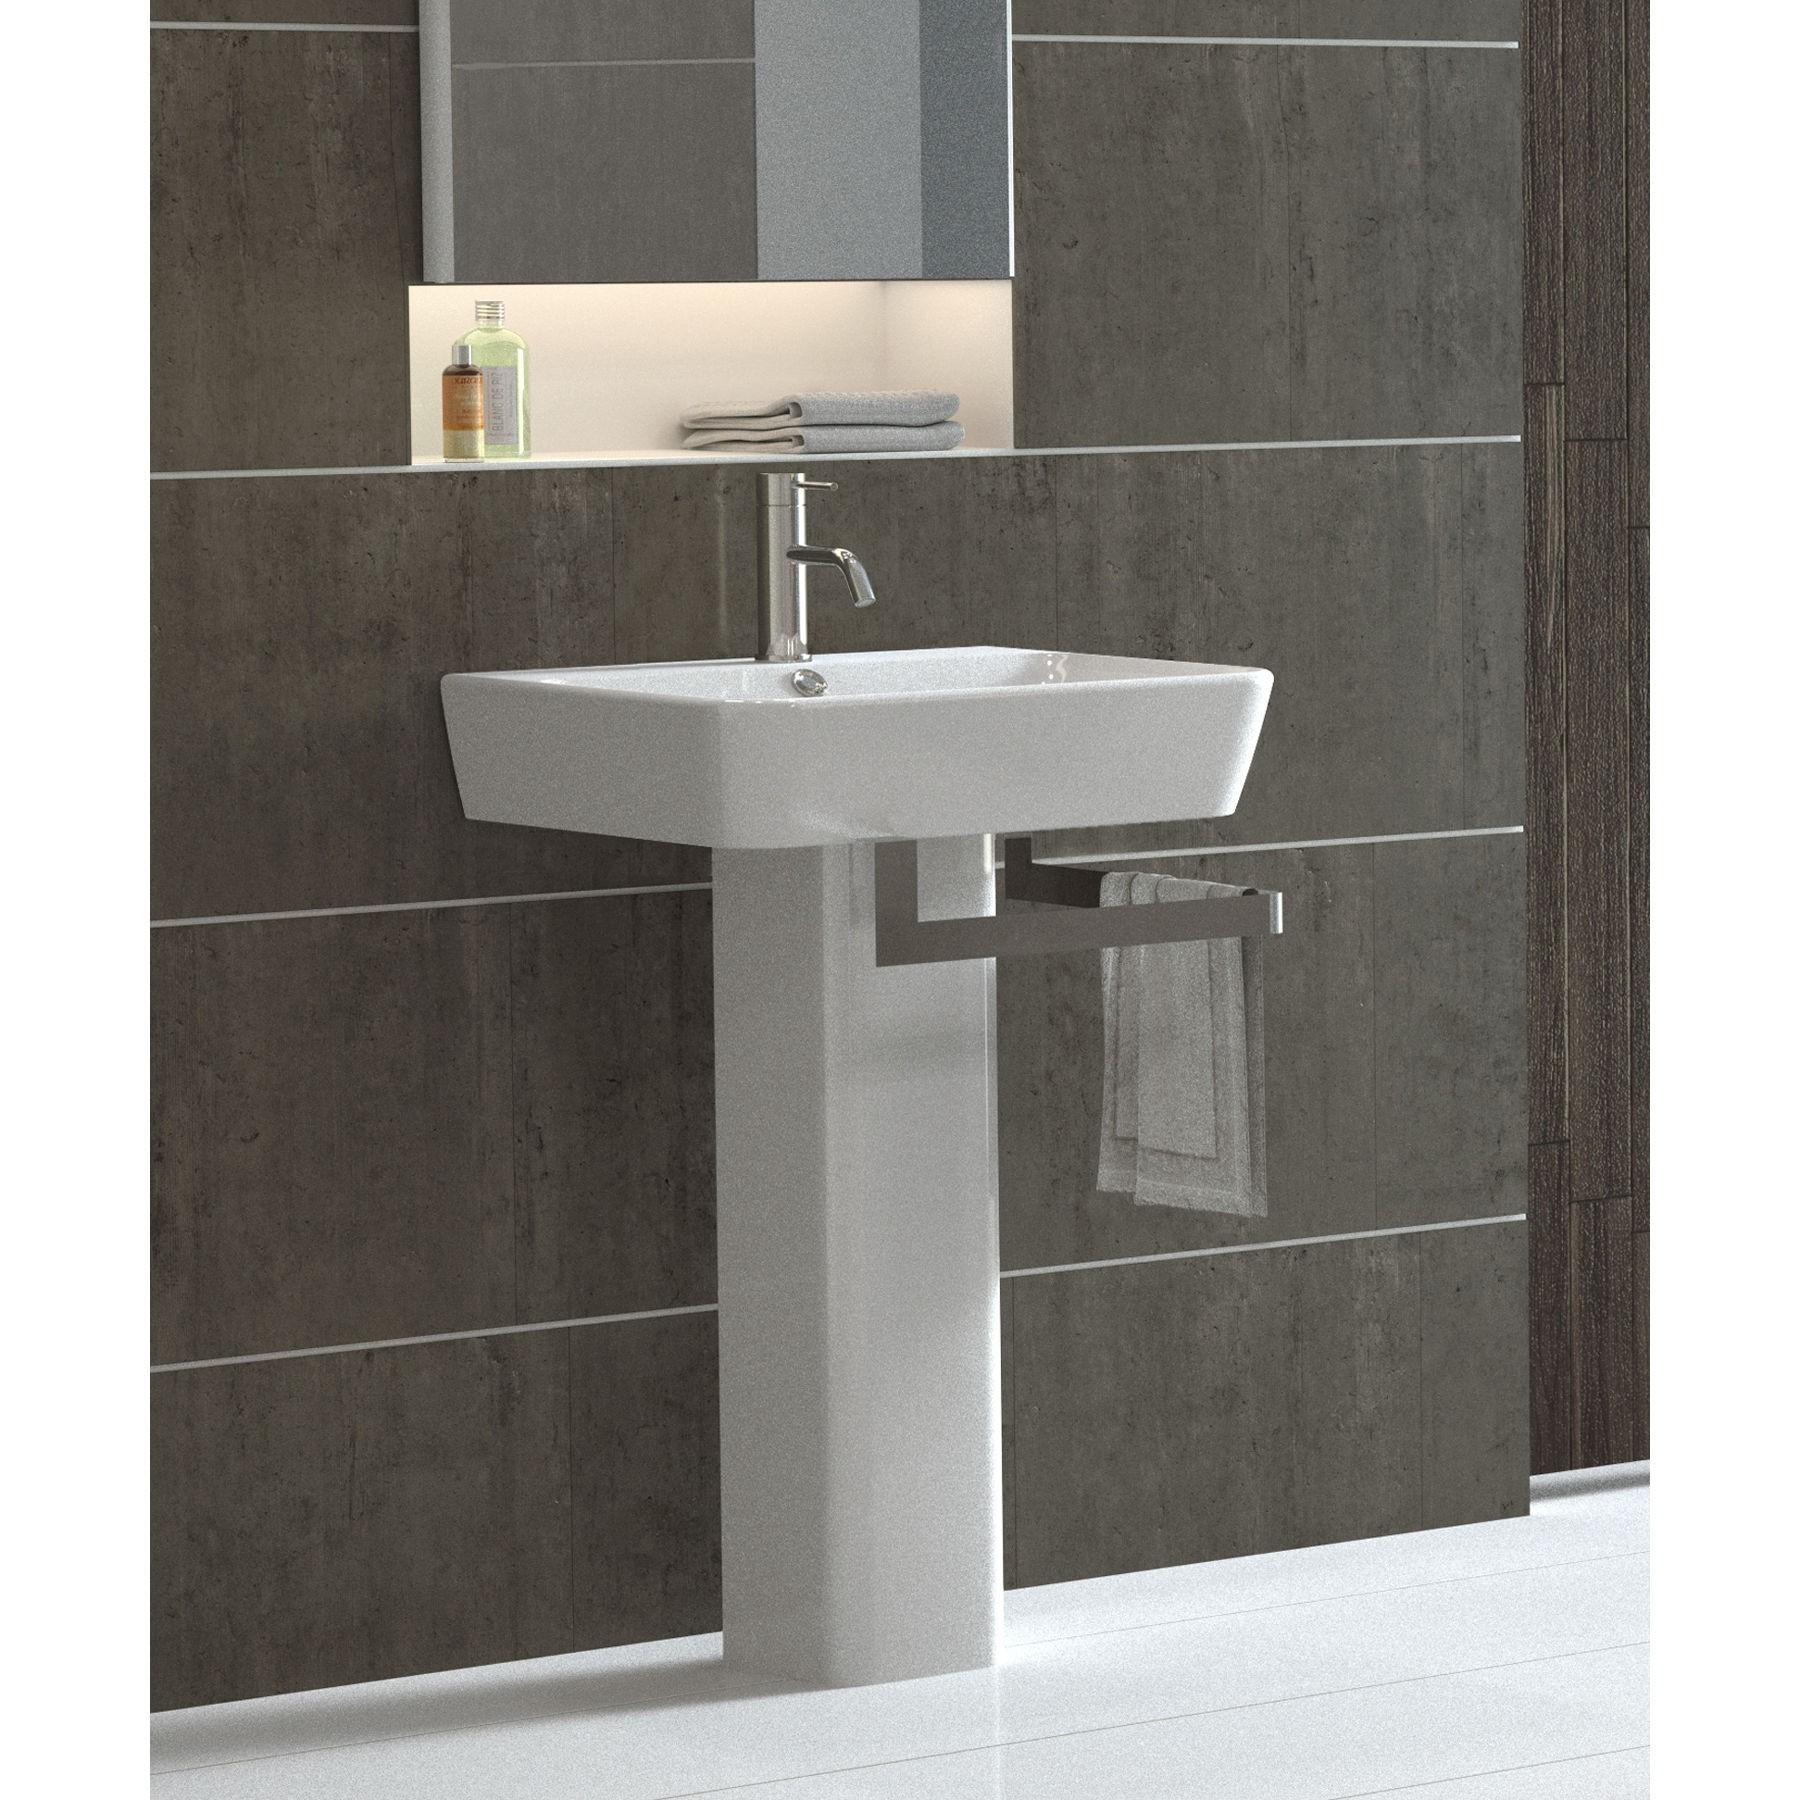 Modern Pedestal Sink With Towel Bar Homesfeed